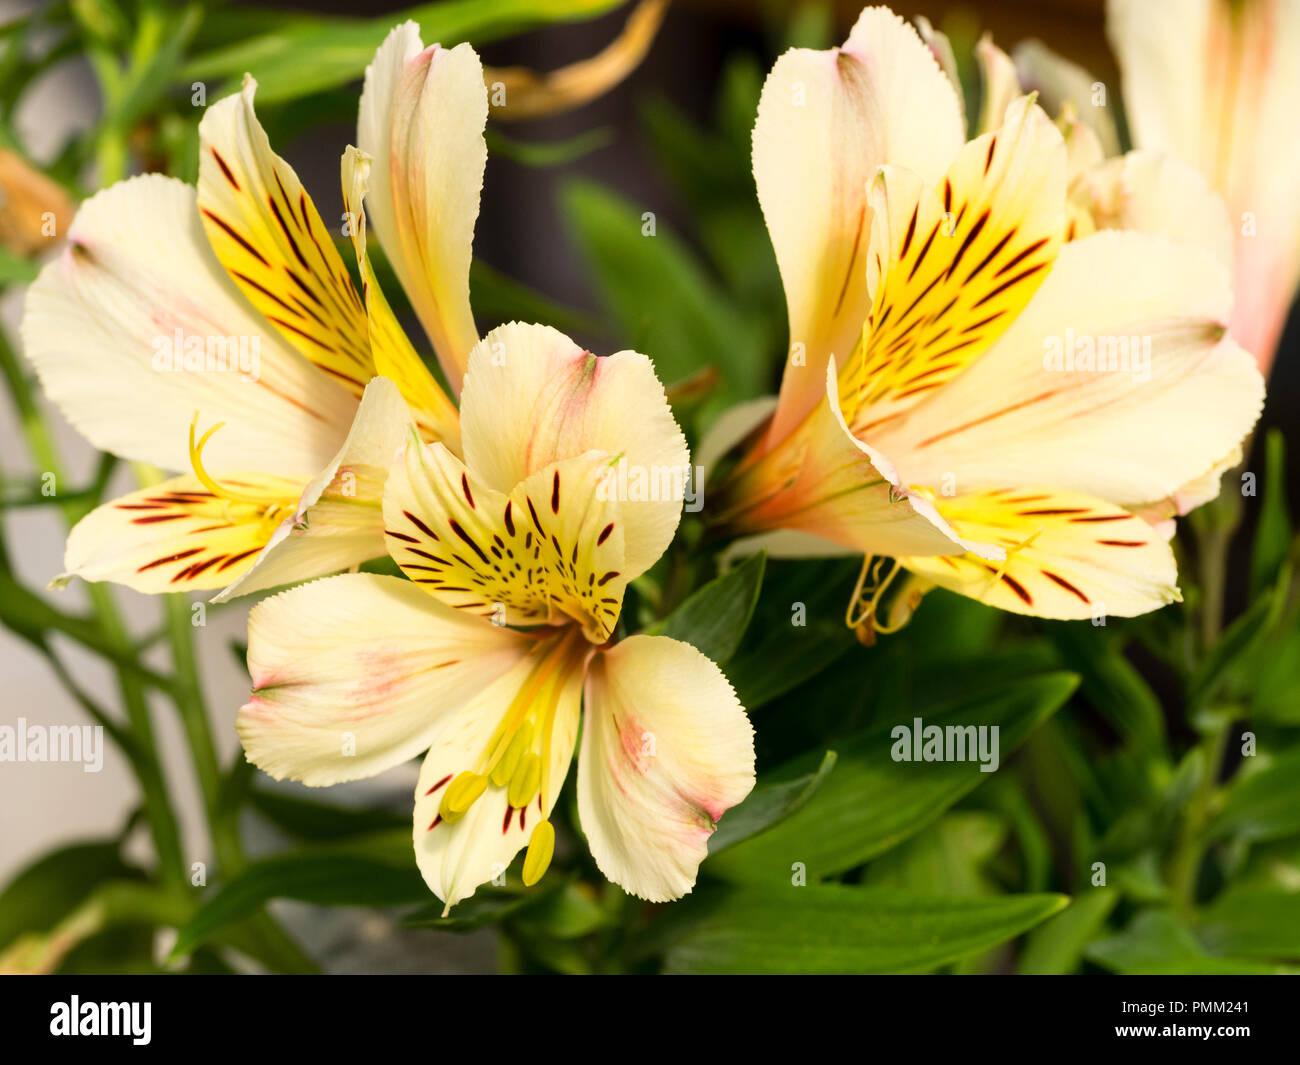 Alstroemeria Perennial Flowers Stock Photos Alstroemeria Perennial